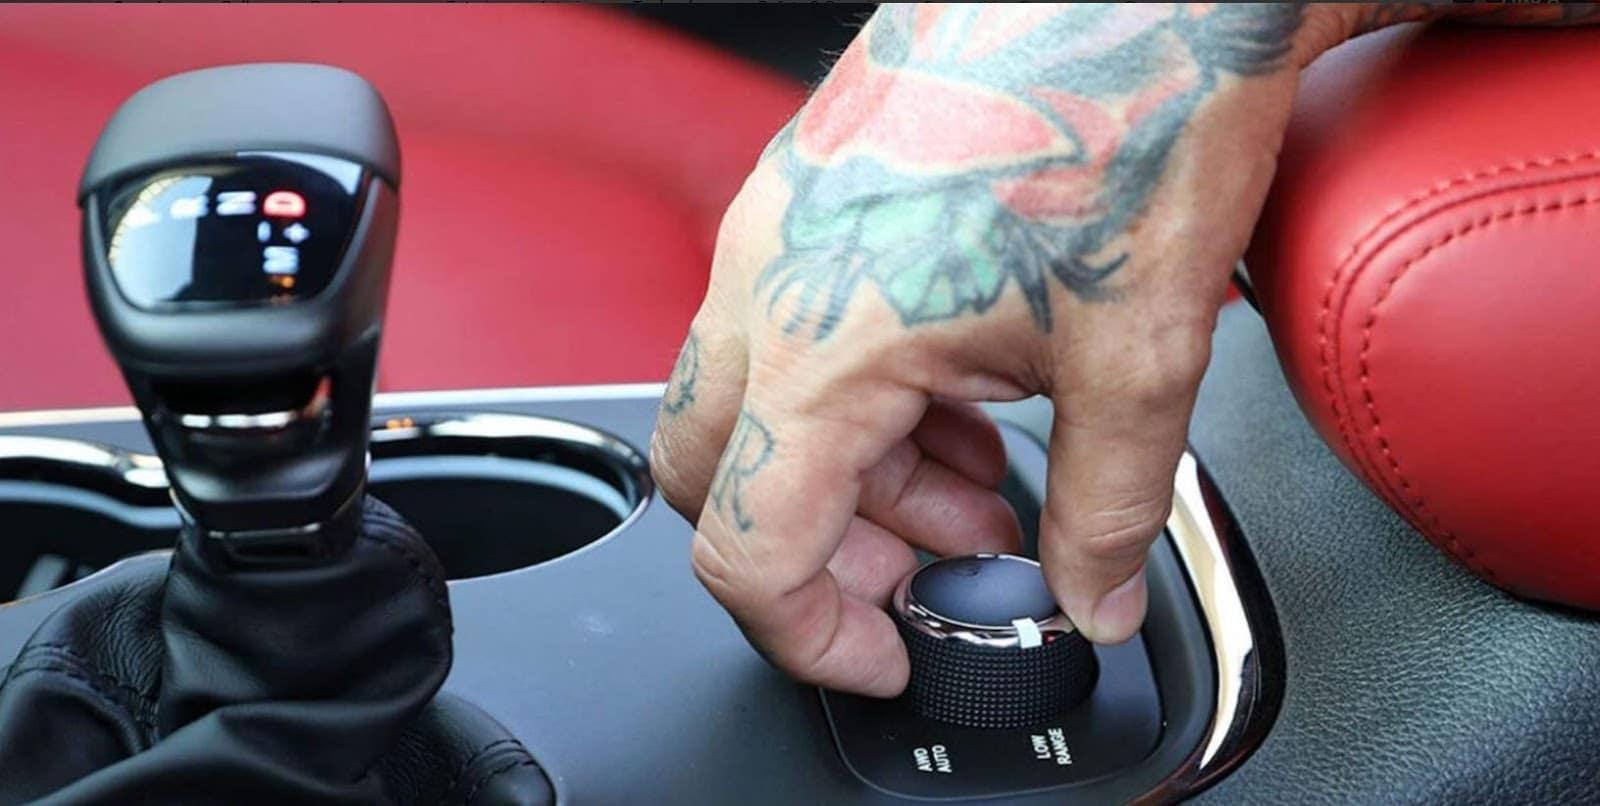 tattooed hand holding knob on 2019 dodge durango srt against bright red interior